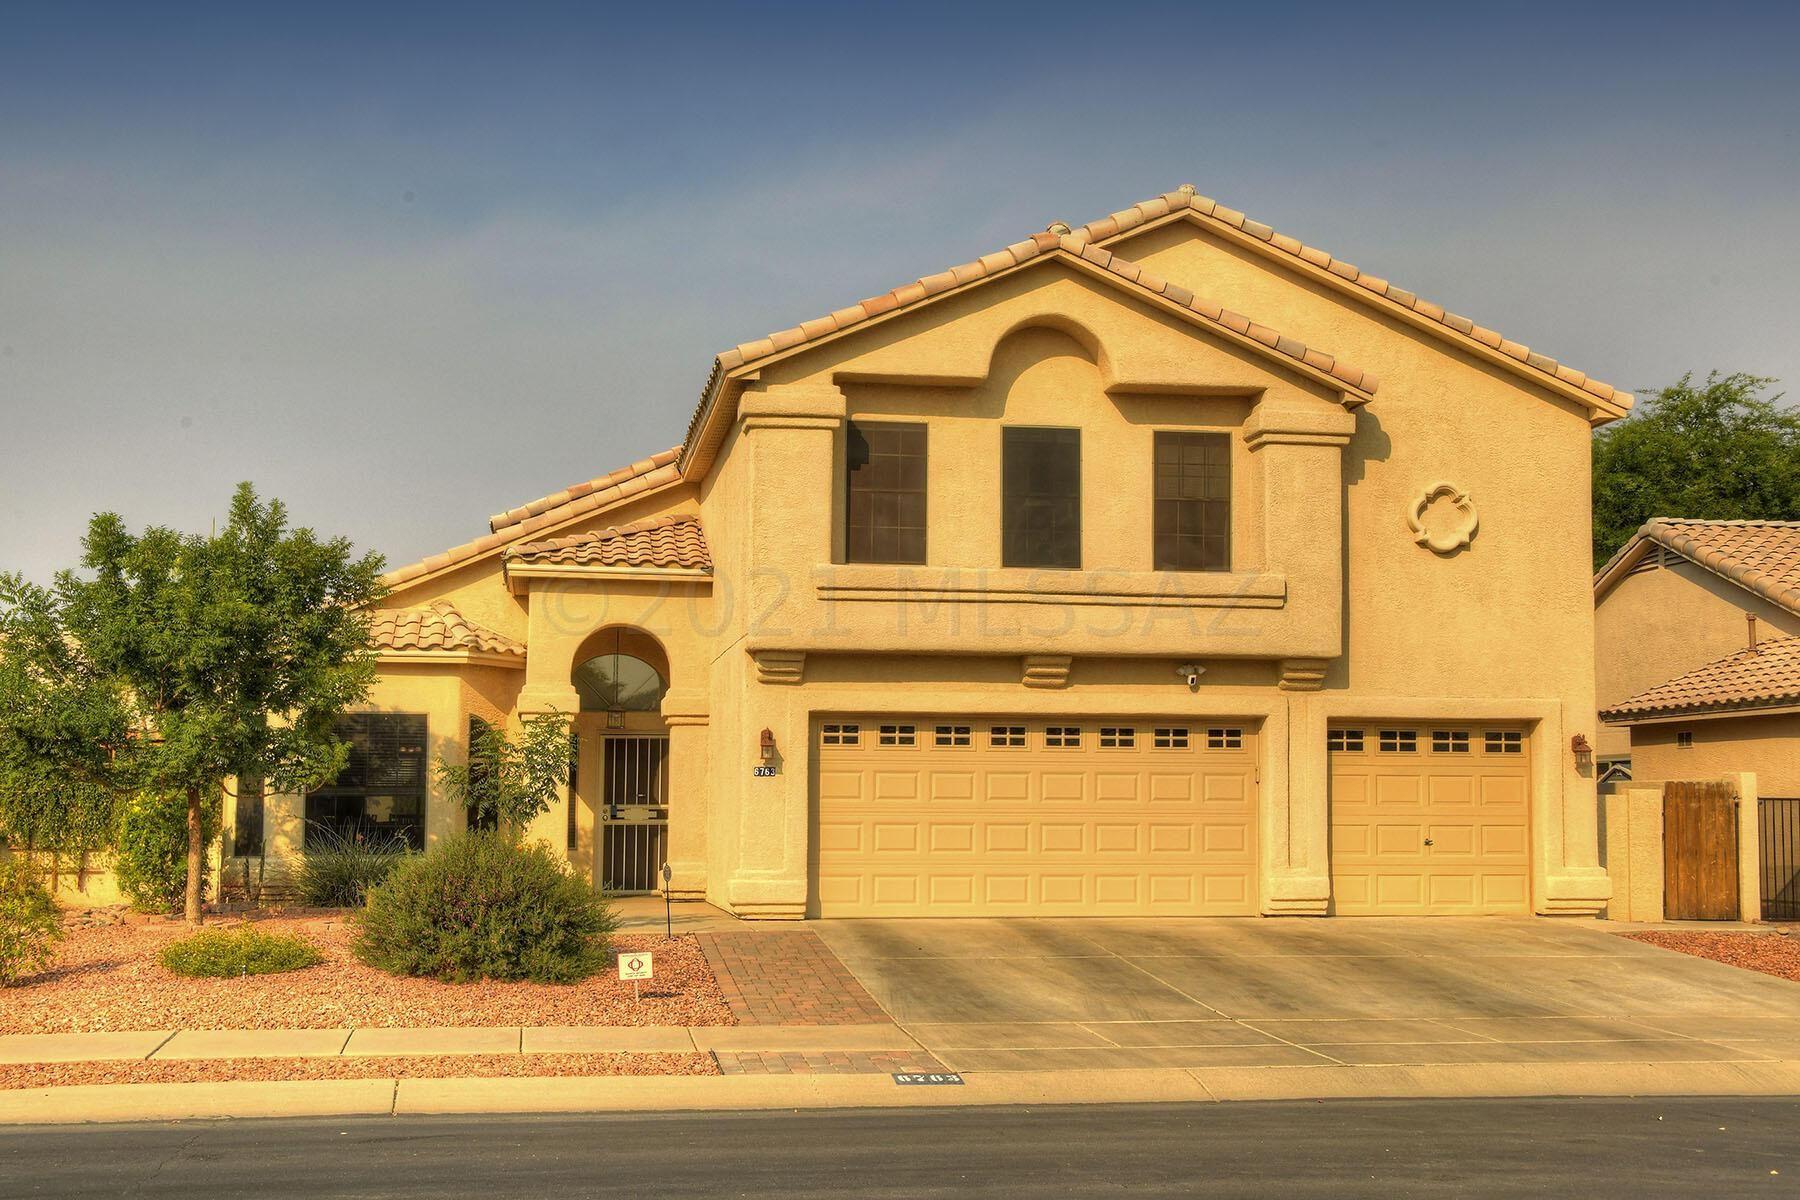 6763 W Redcliff Way, Tucson, AZ 85743 - MLS#: 22115316